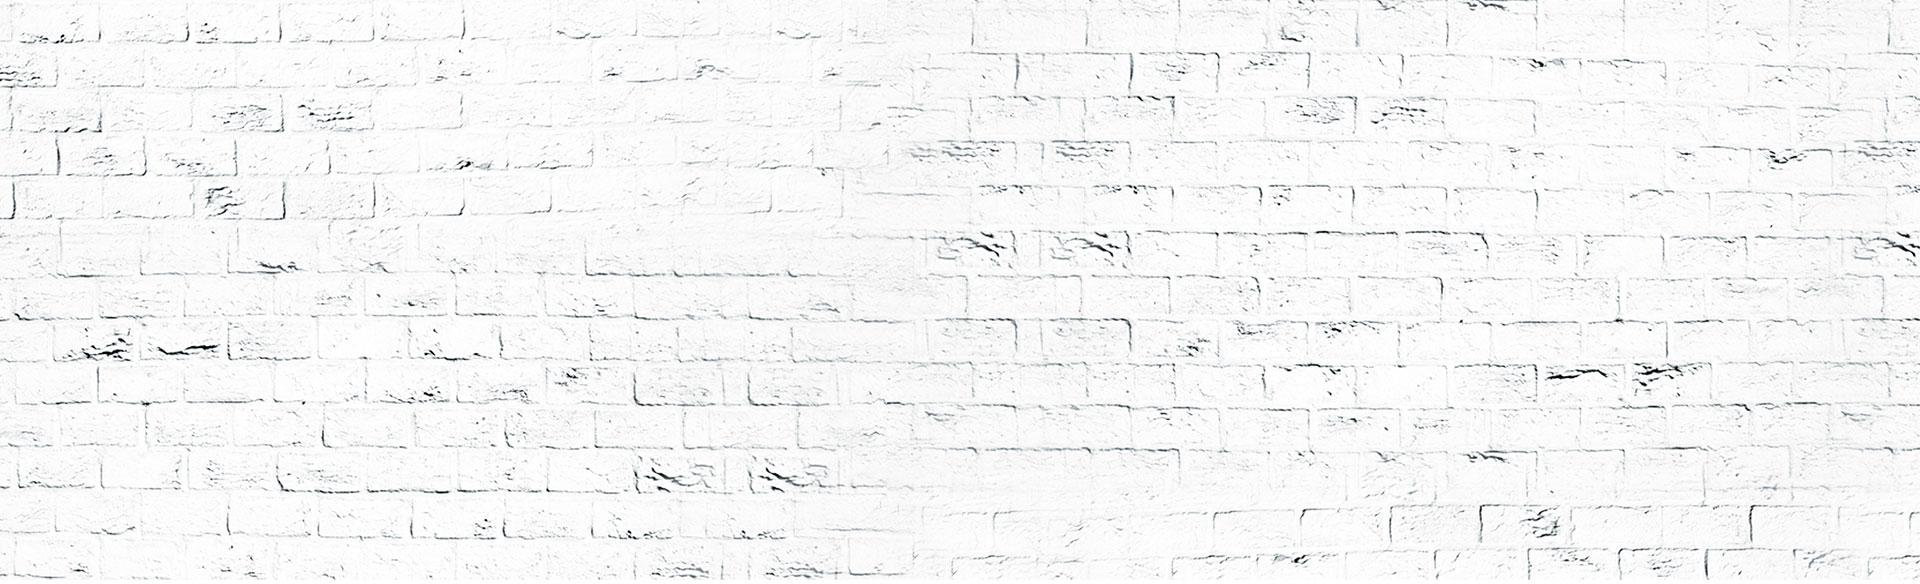 Melb2016_BrickWall-1920x300